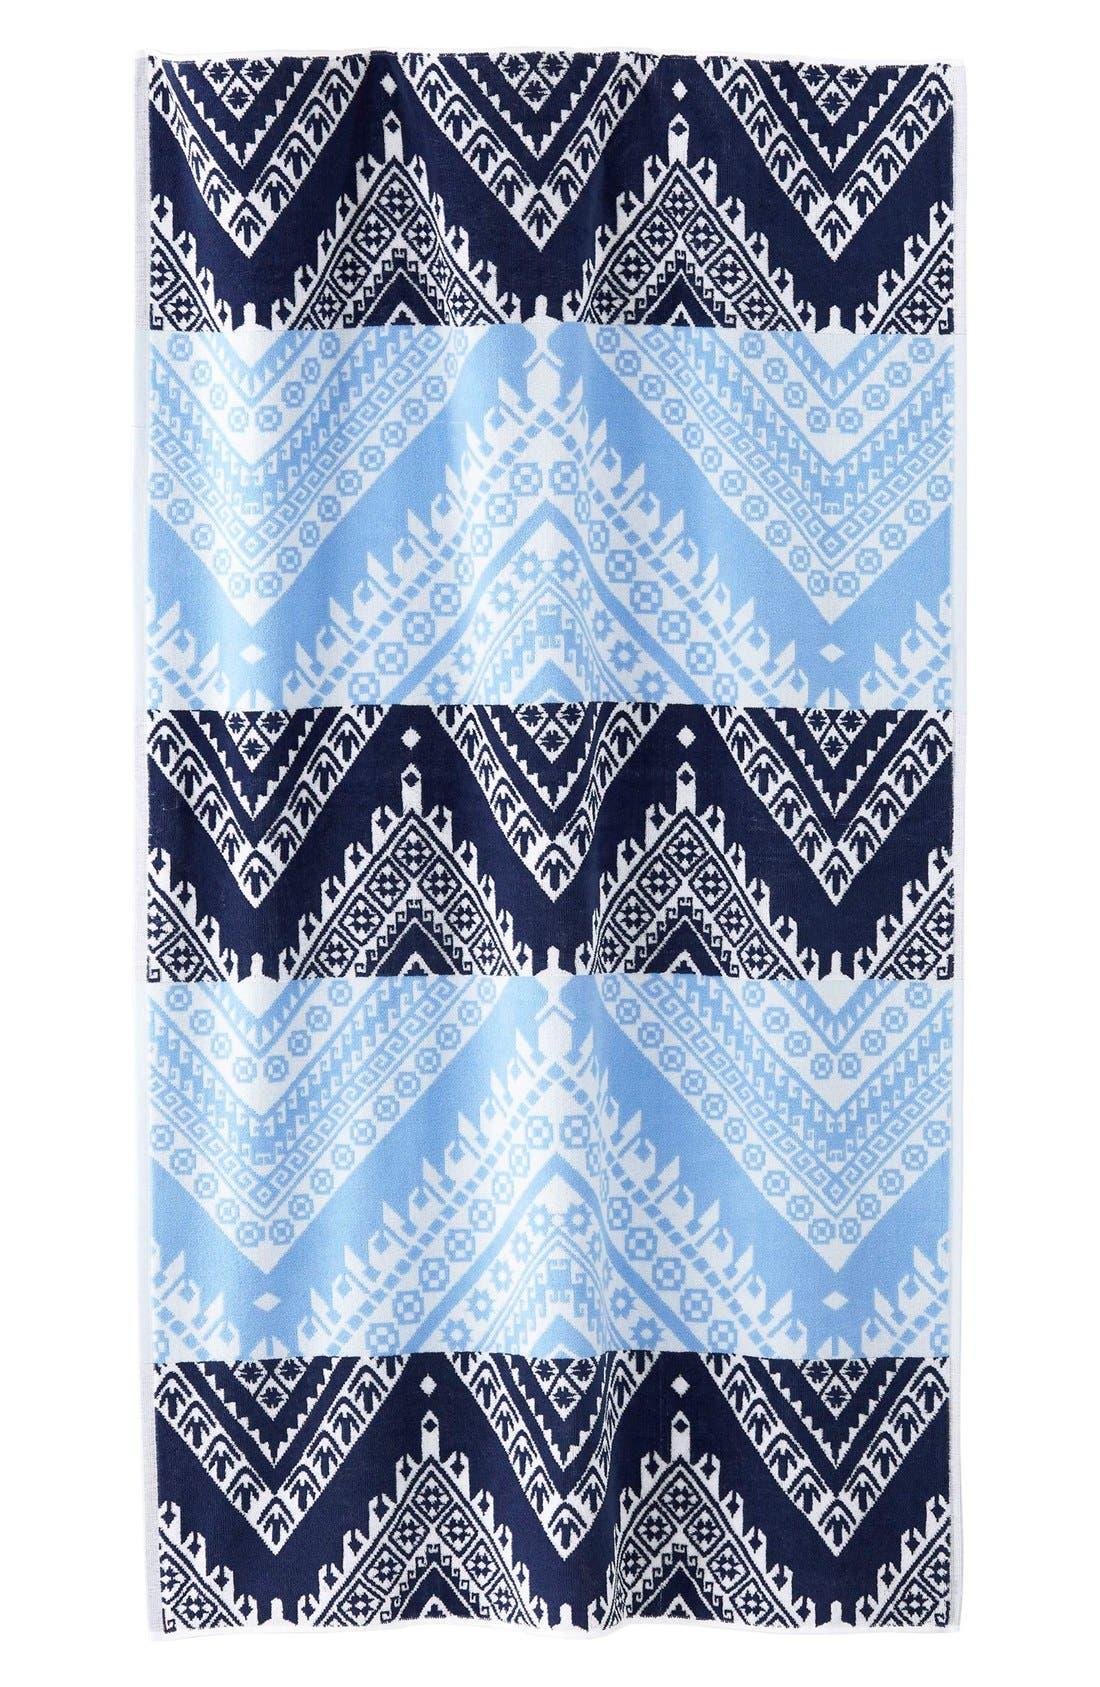 'Koh' Chevron Wave Pattern Beach Towel,                             Main thumbnail 1, color,                             400